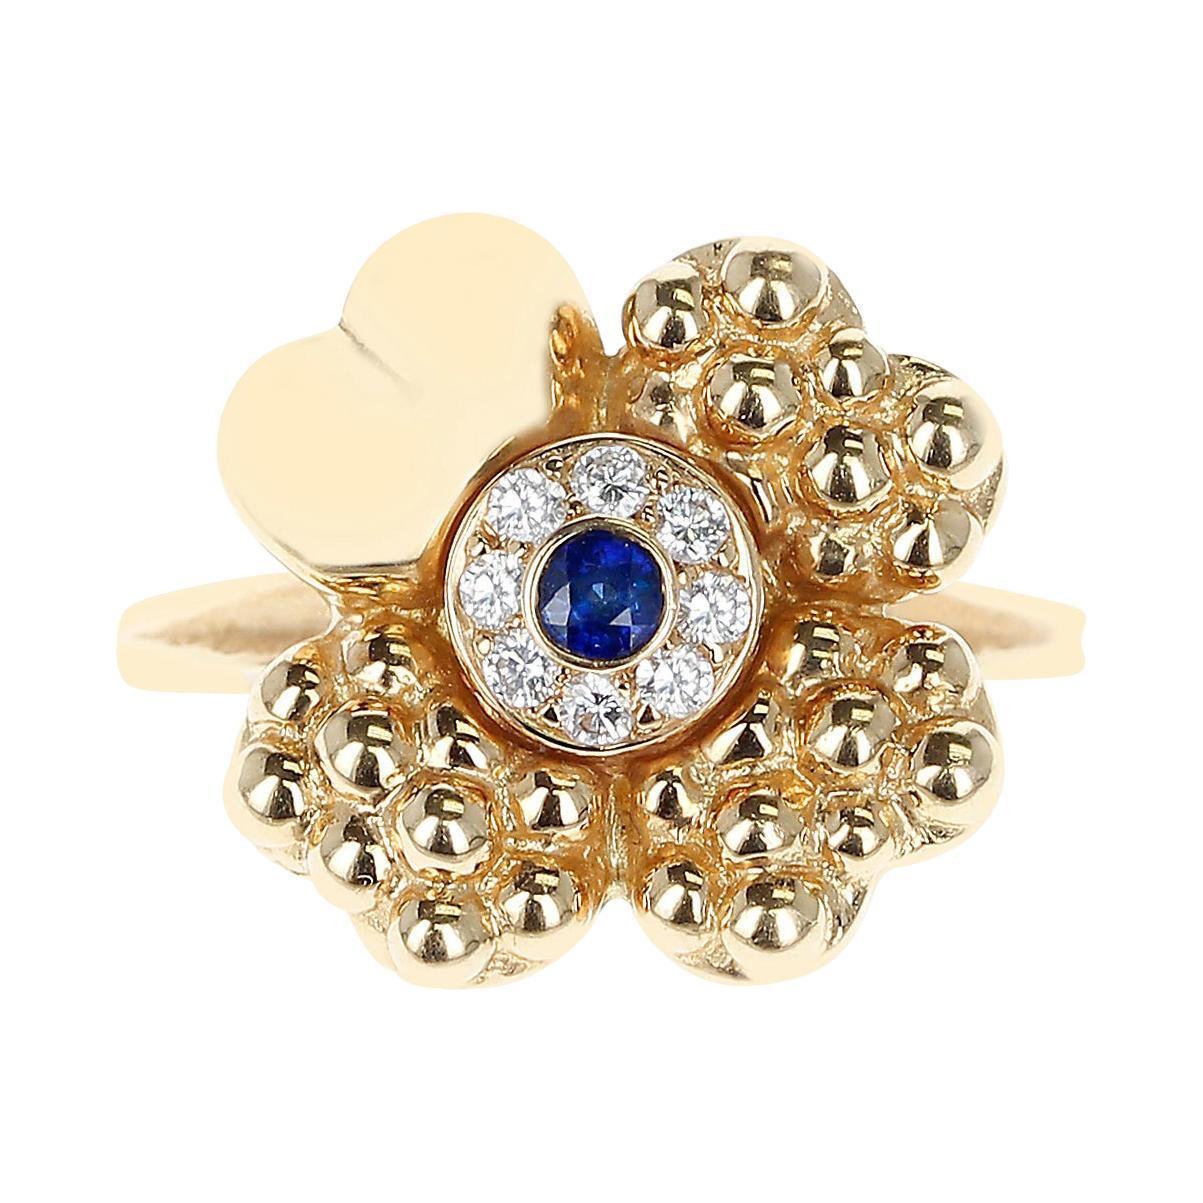 Paris Clover Ring with Diamonds and Center Blue Sapphire, 18 Karat Yellow Gold